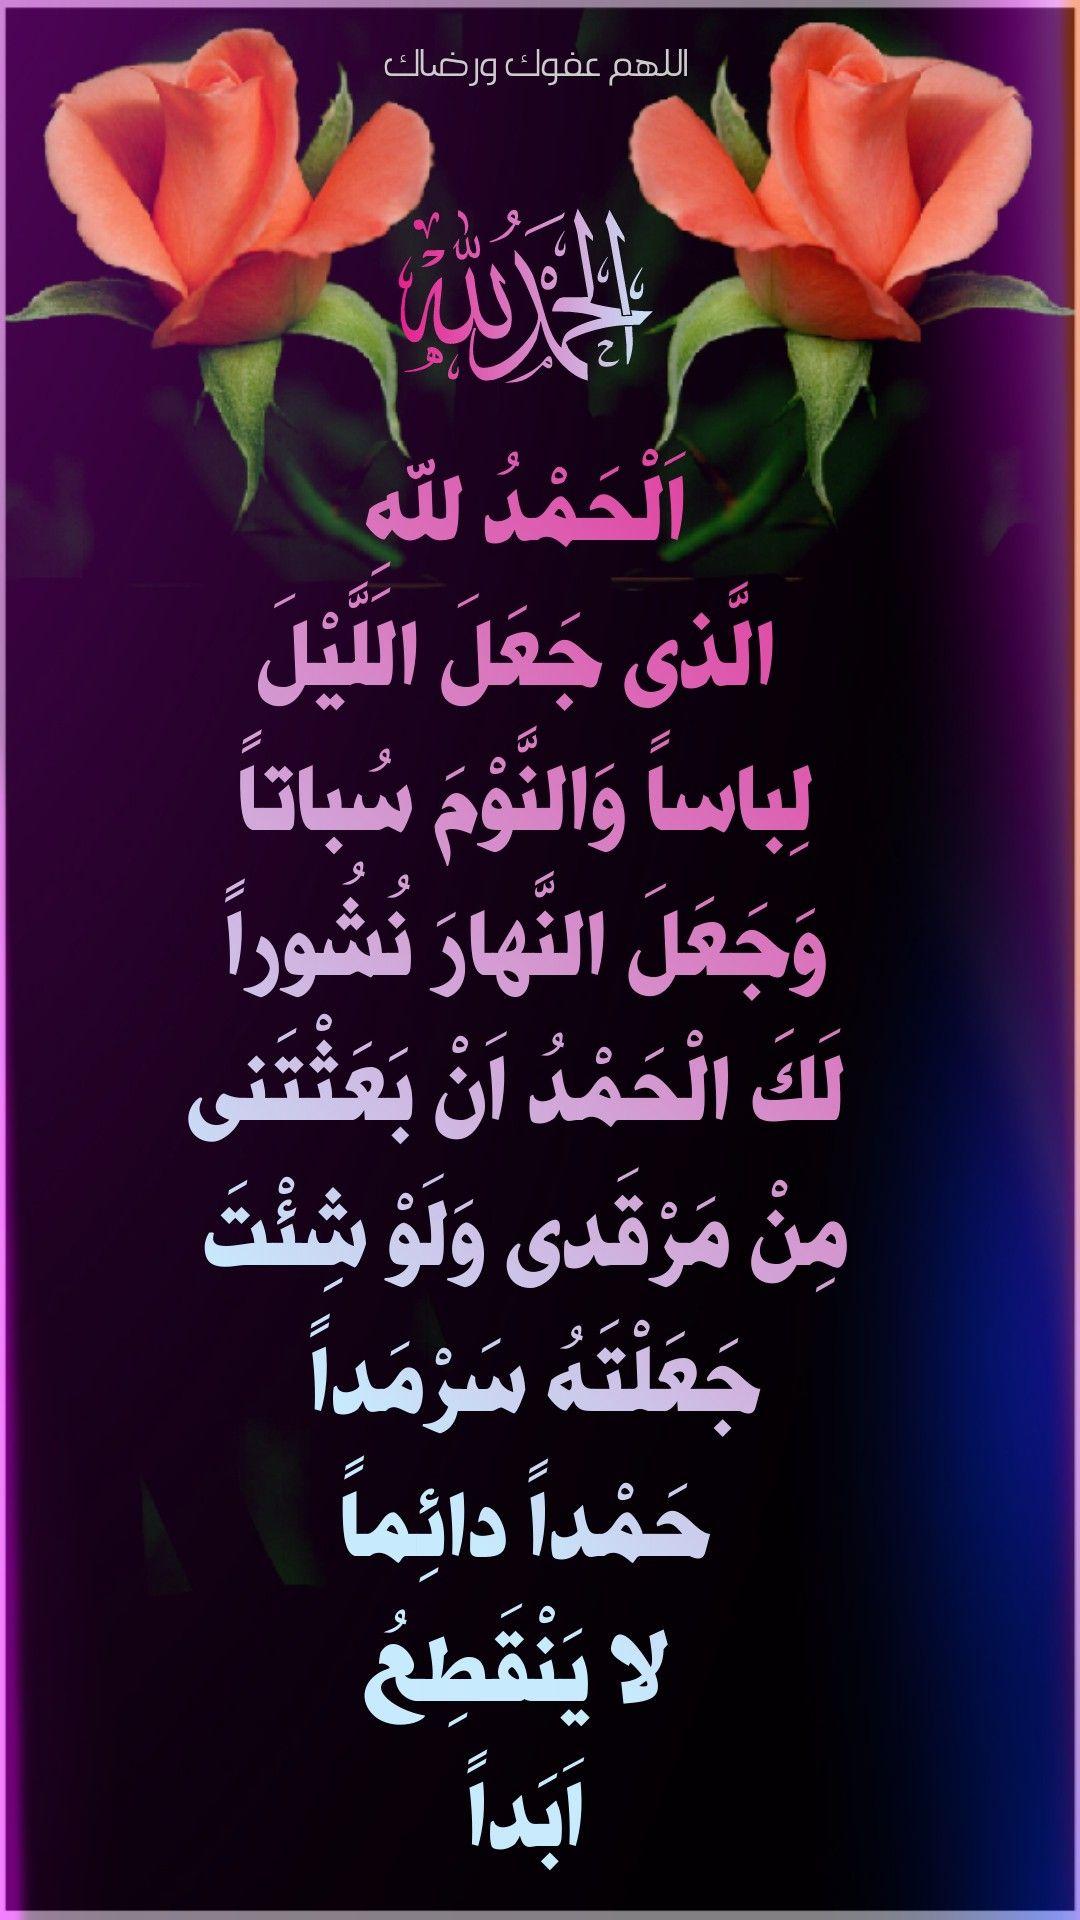 الحمدلله Good Morning Arabic Islamic Art Calligraphy Islamic Pictures